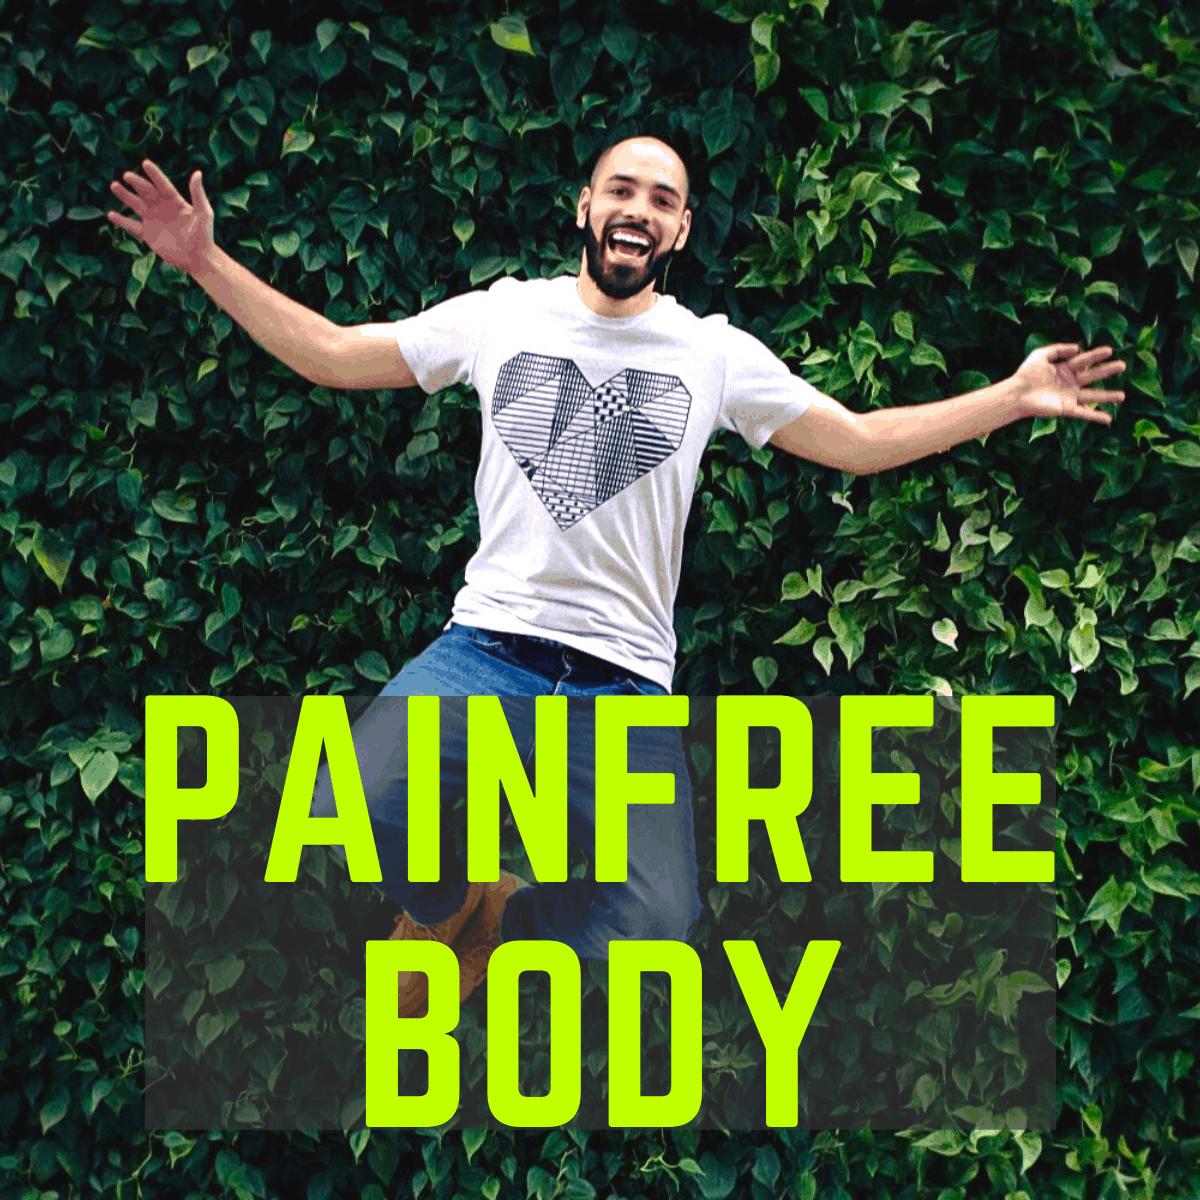 Painfree body